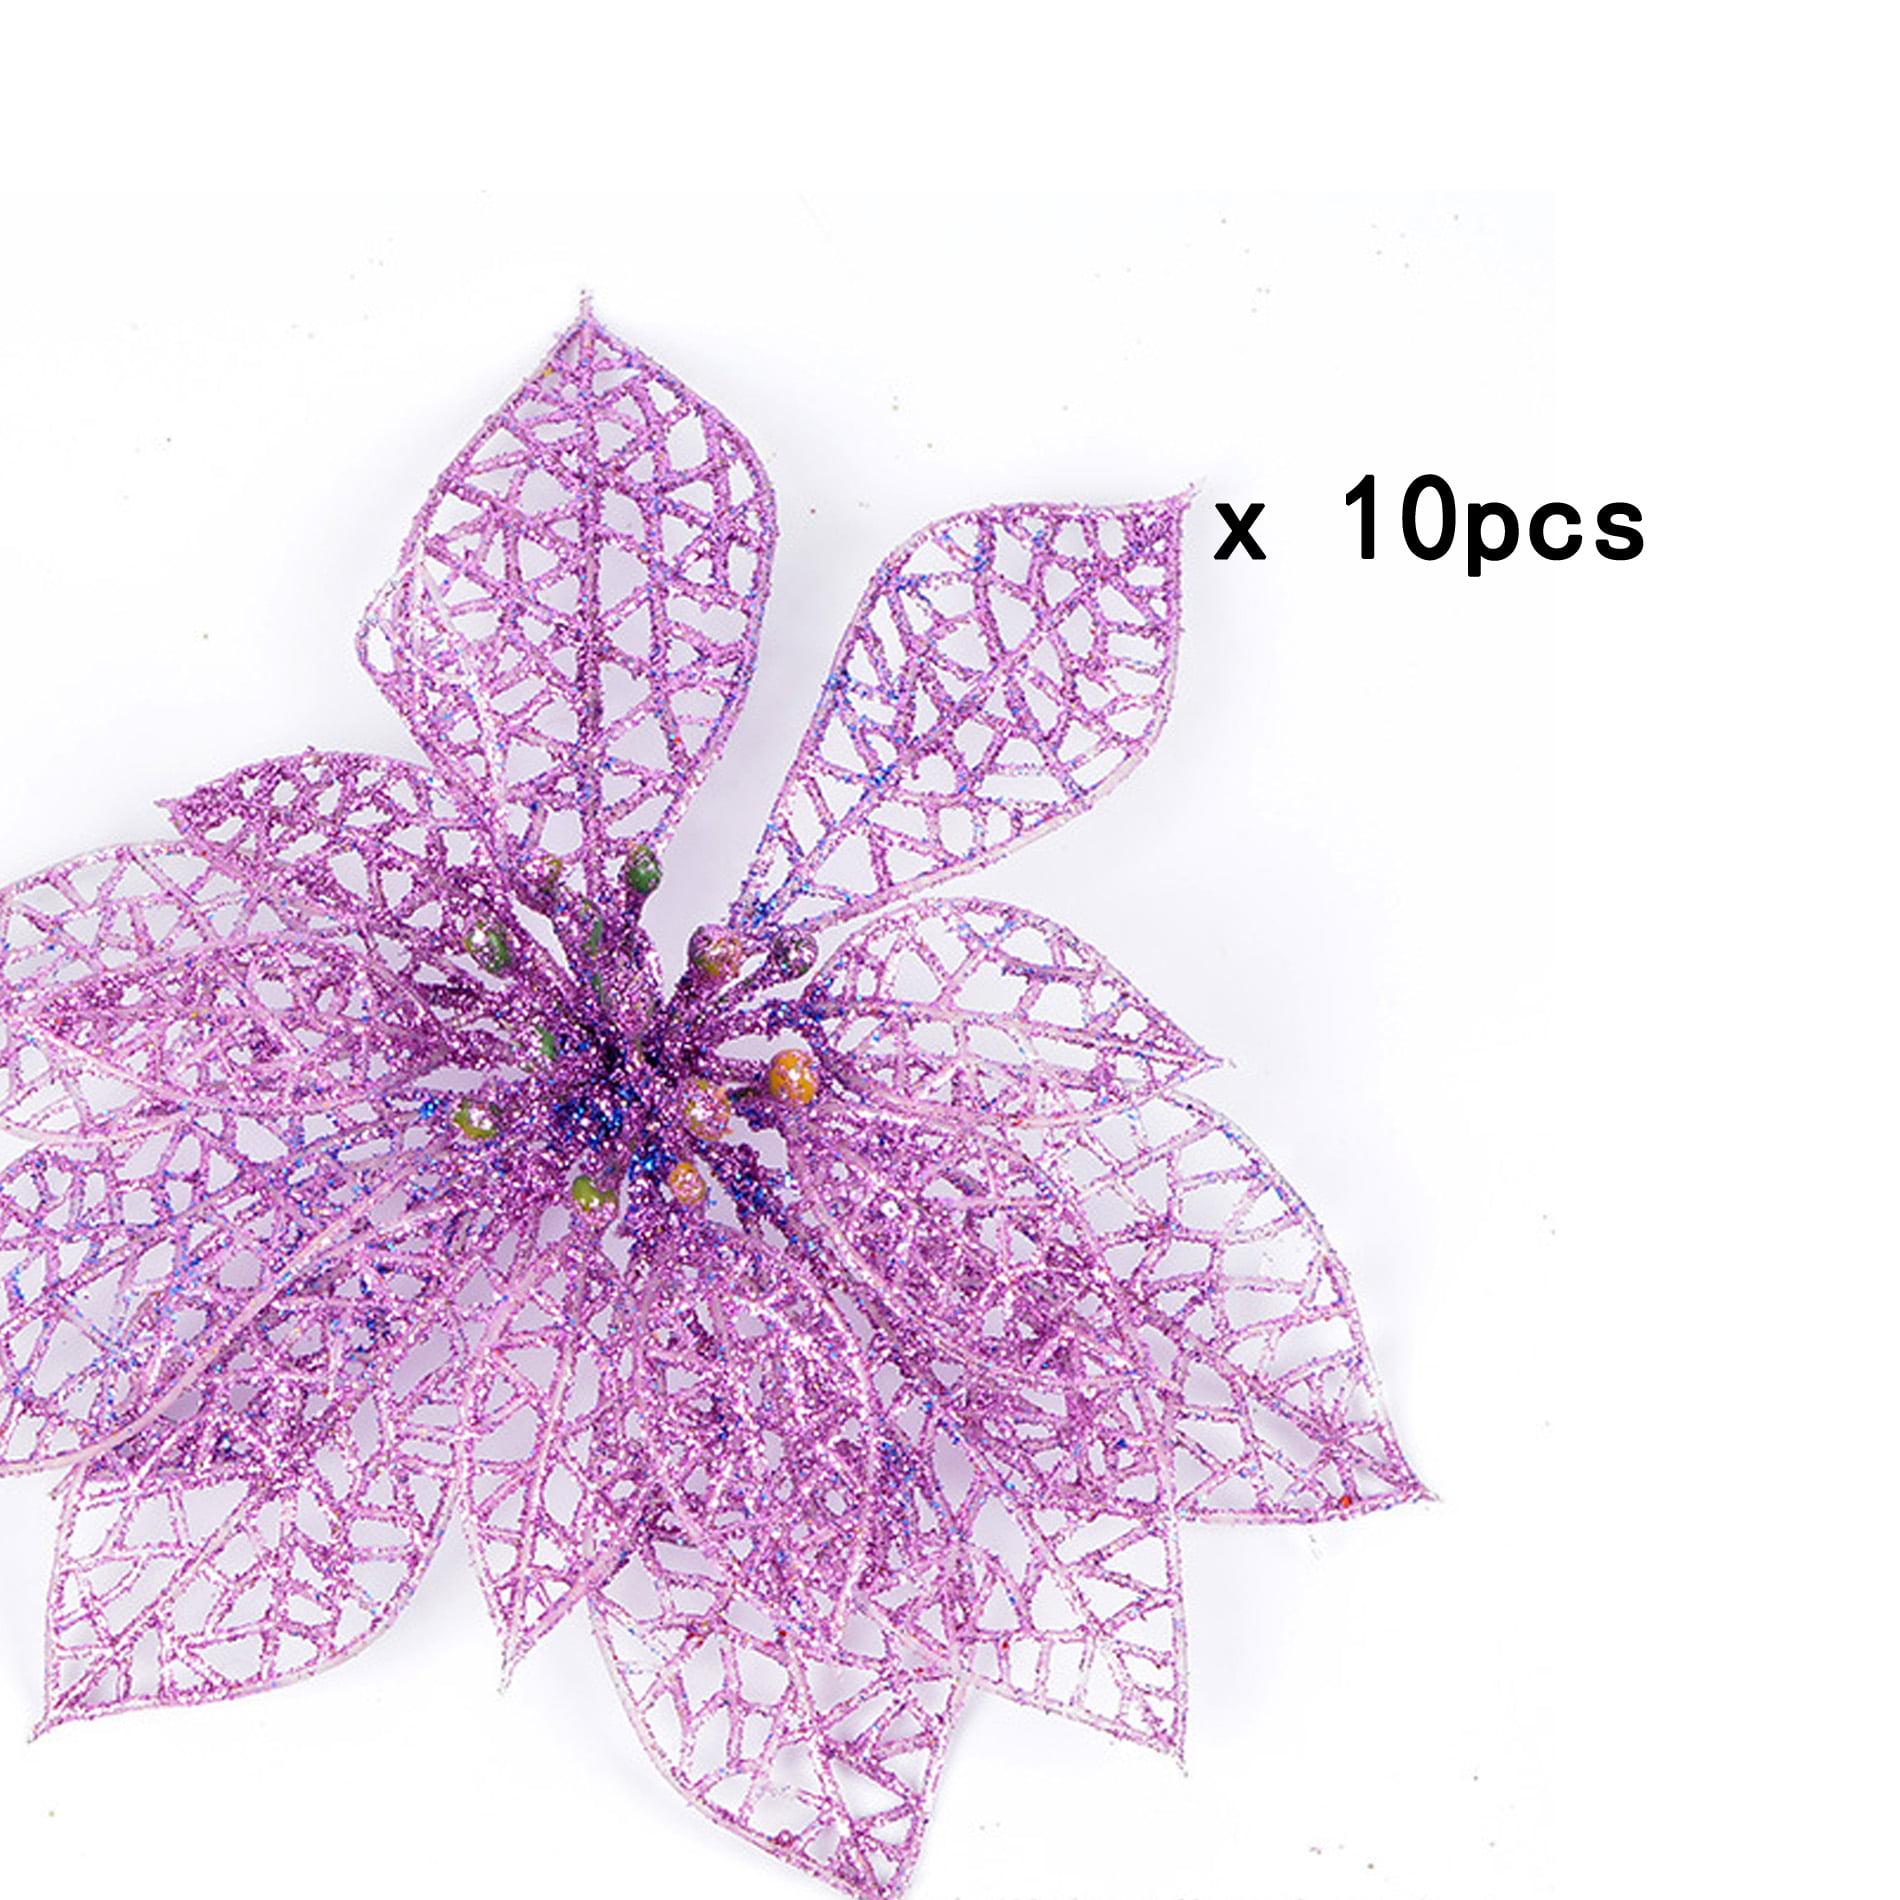 10 x Christmas Tree Artificial Glitter Flowers for Xmas Tree Decor Wedding Party